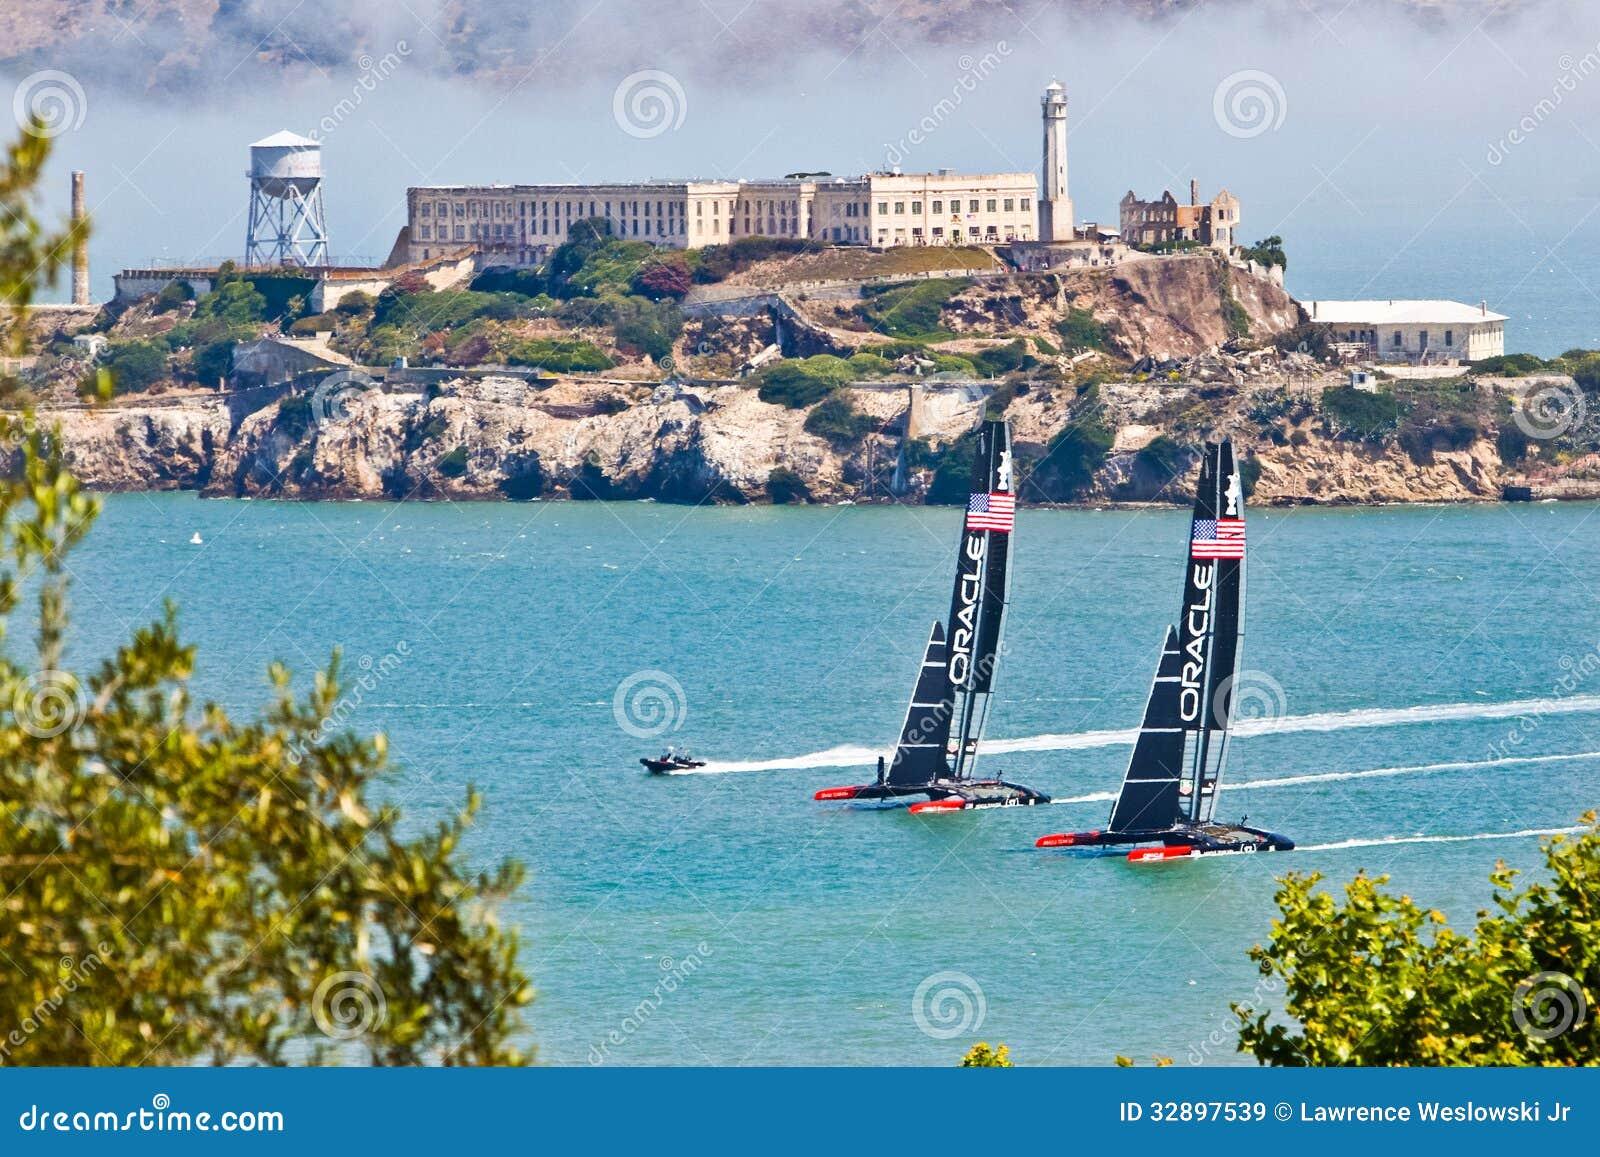 San Francisco America's Cup Team Oracle Passing Alcatraz